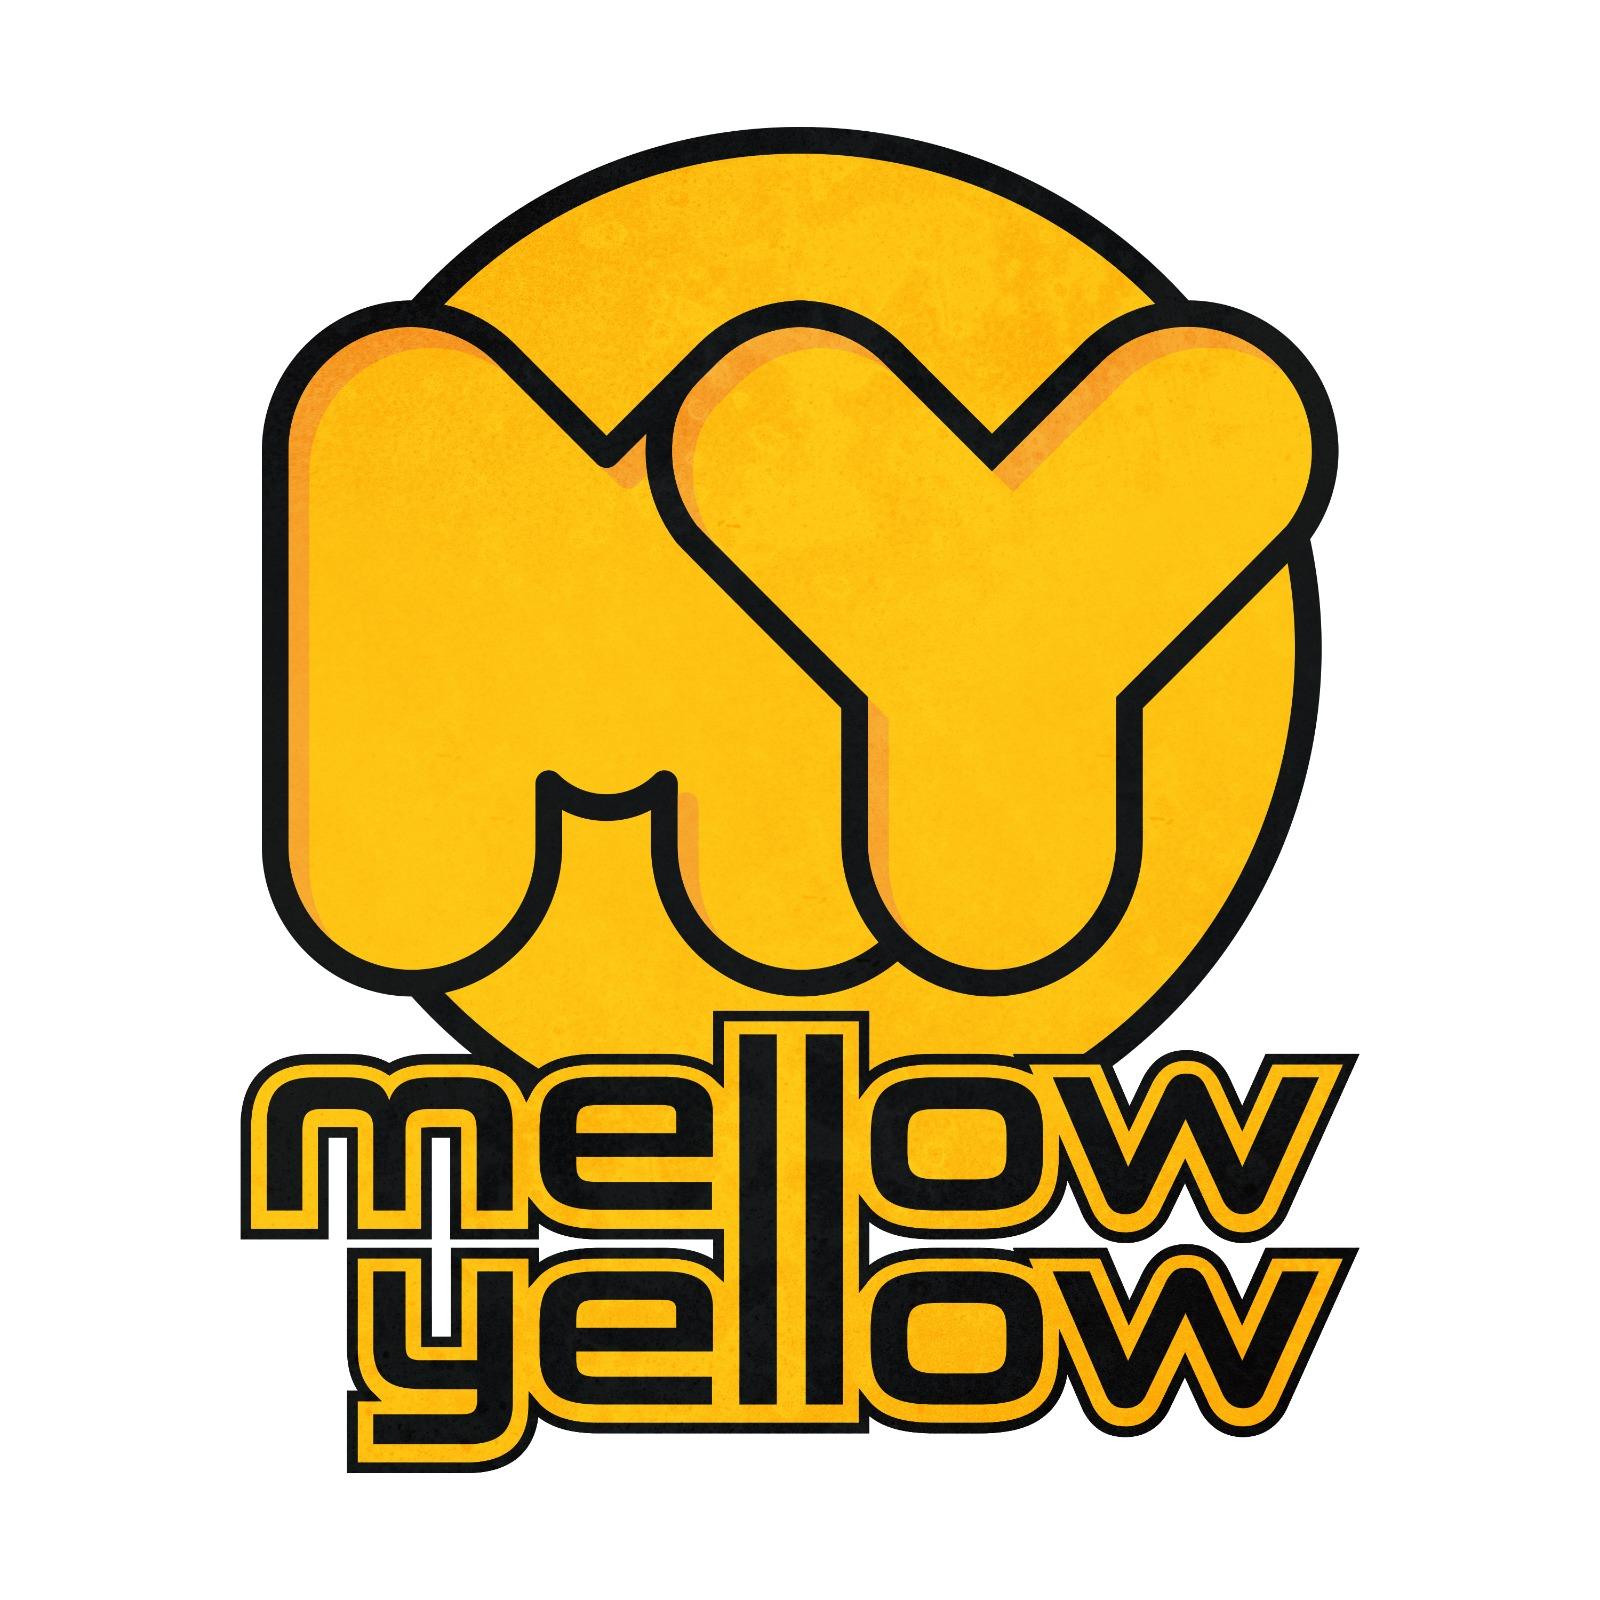 Mello yello clipart jpg royalty free download Mellow Yellow | Jelle\'sMarbleRuns Wiki | FANDOM powered by Wikia jpg royalty free download